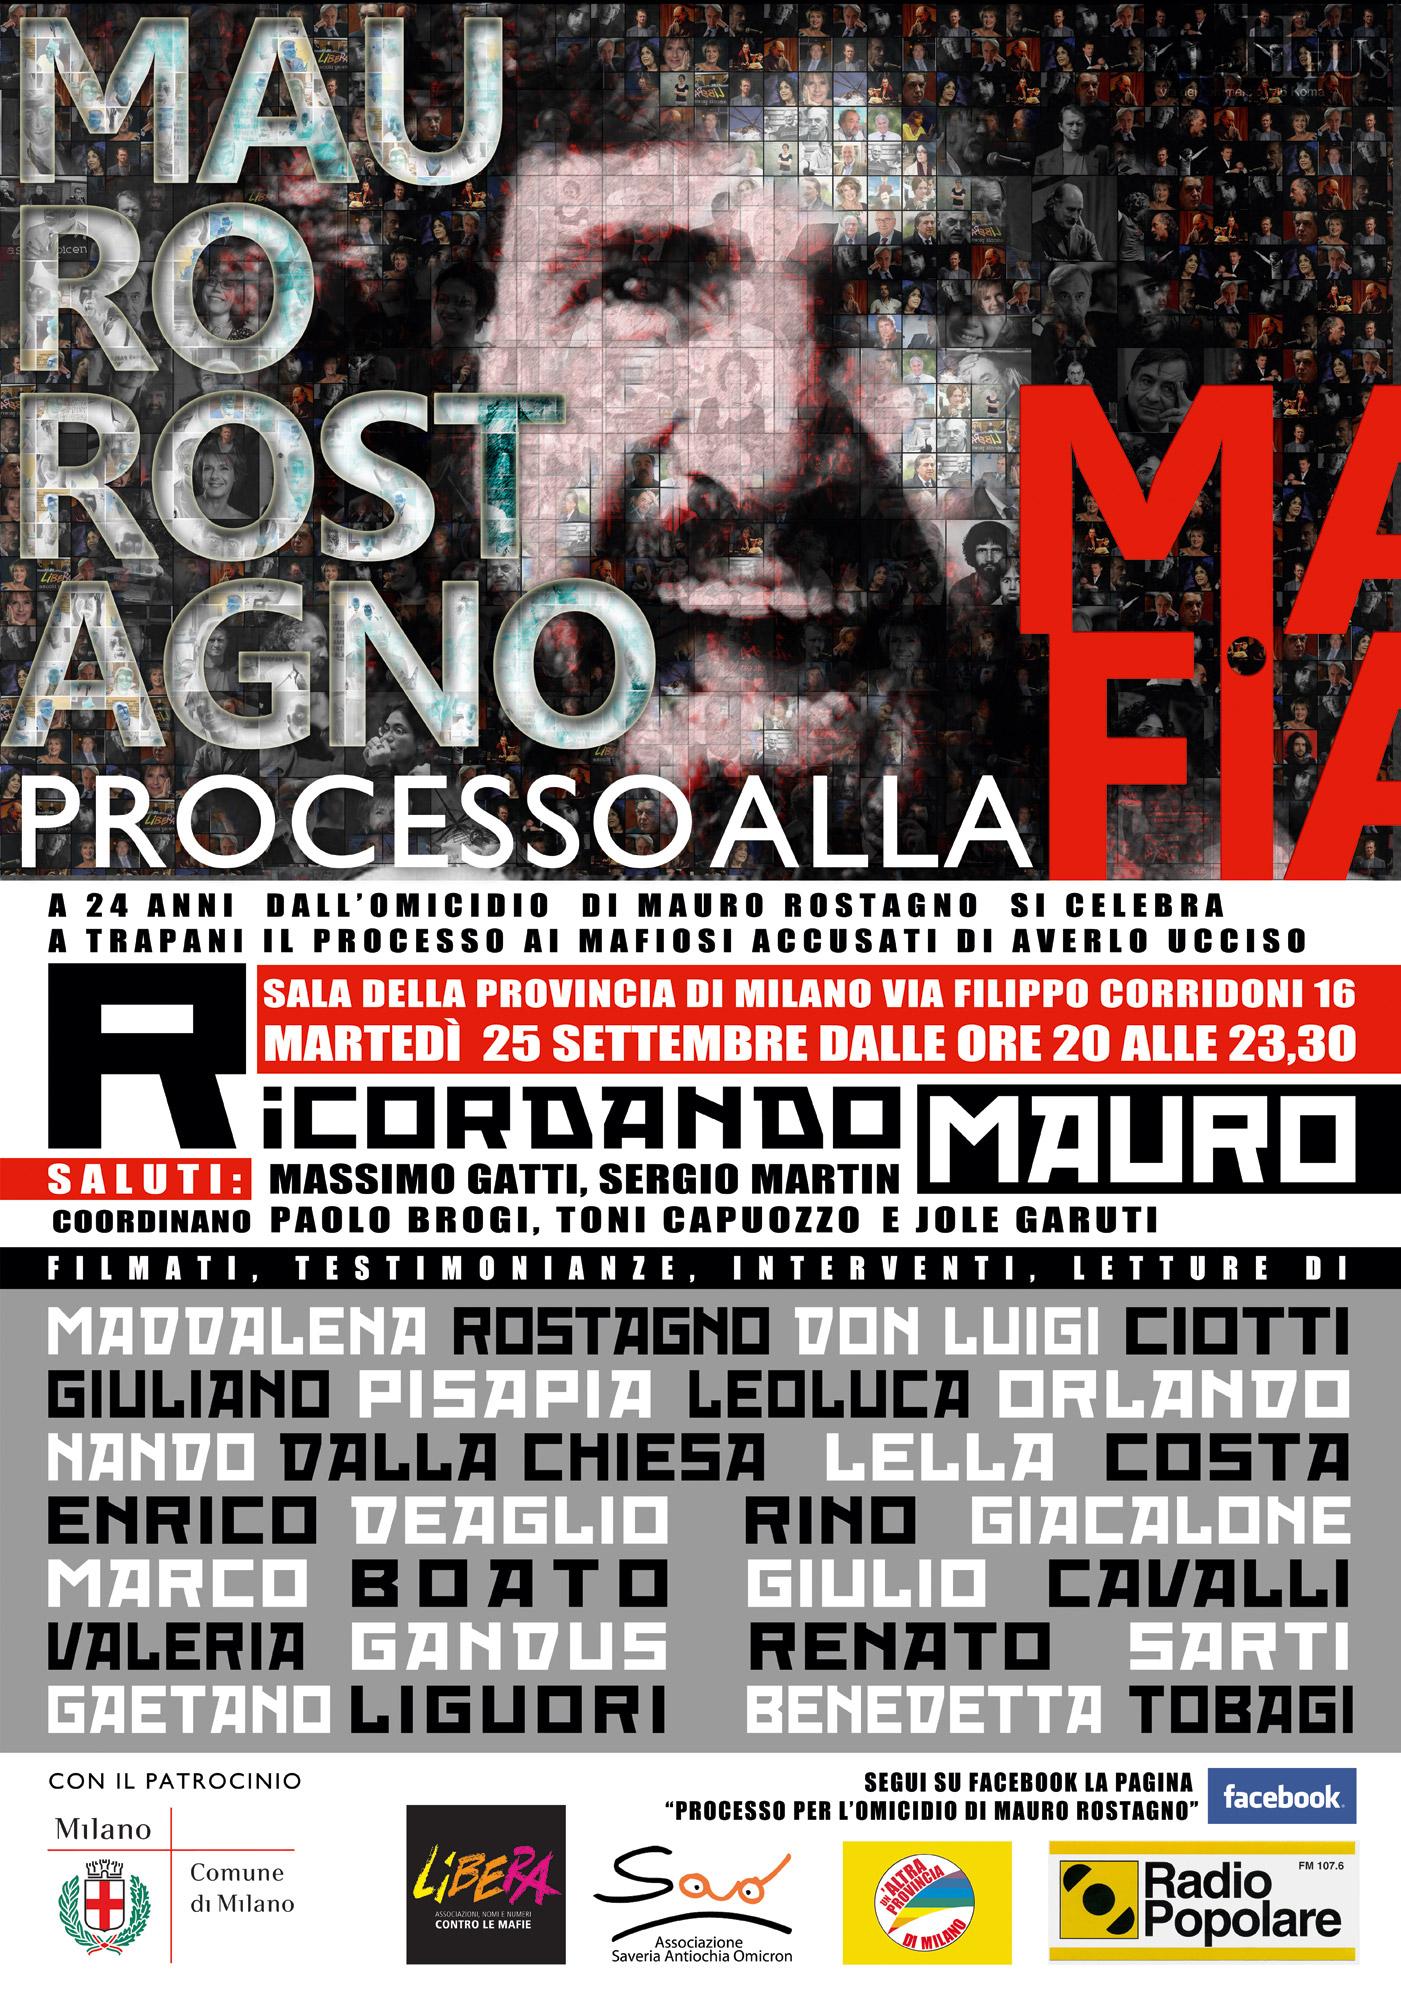 Ricordando Mauro Rostagno: Don Luigi Ciotti